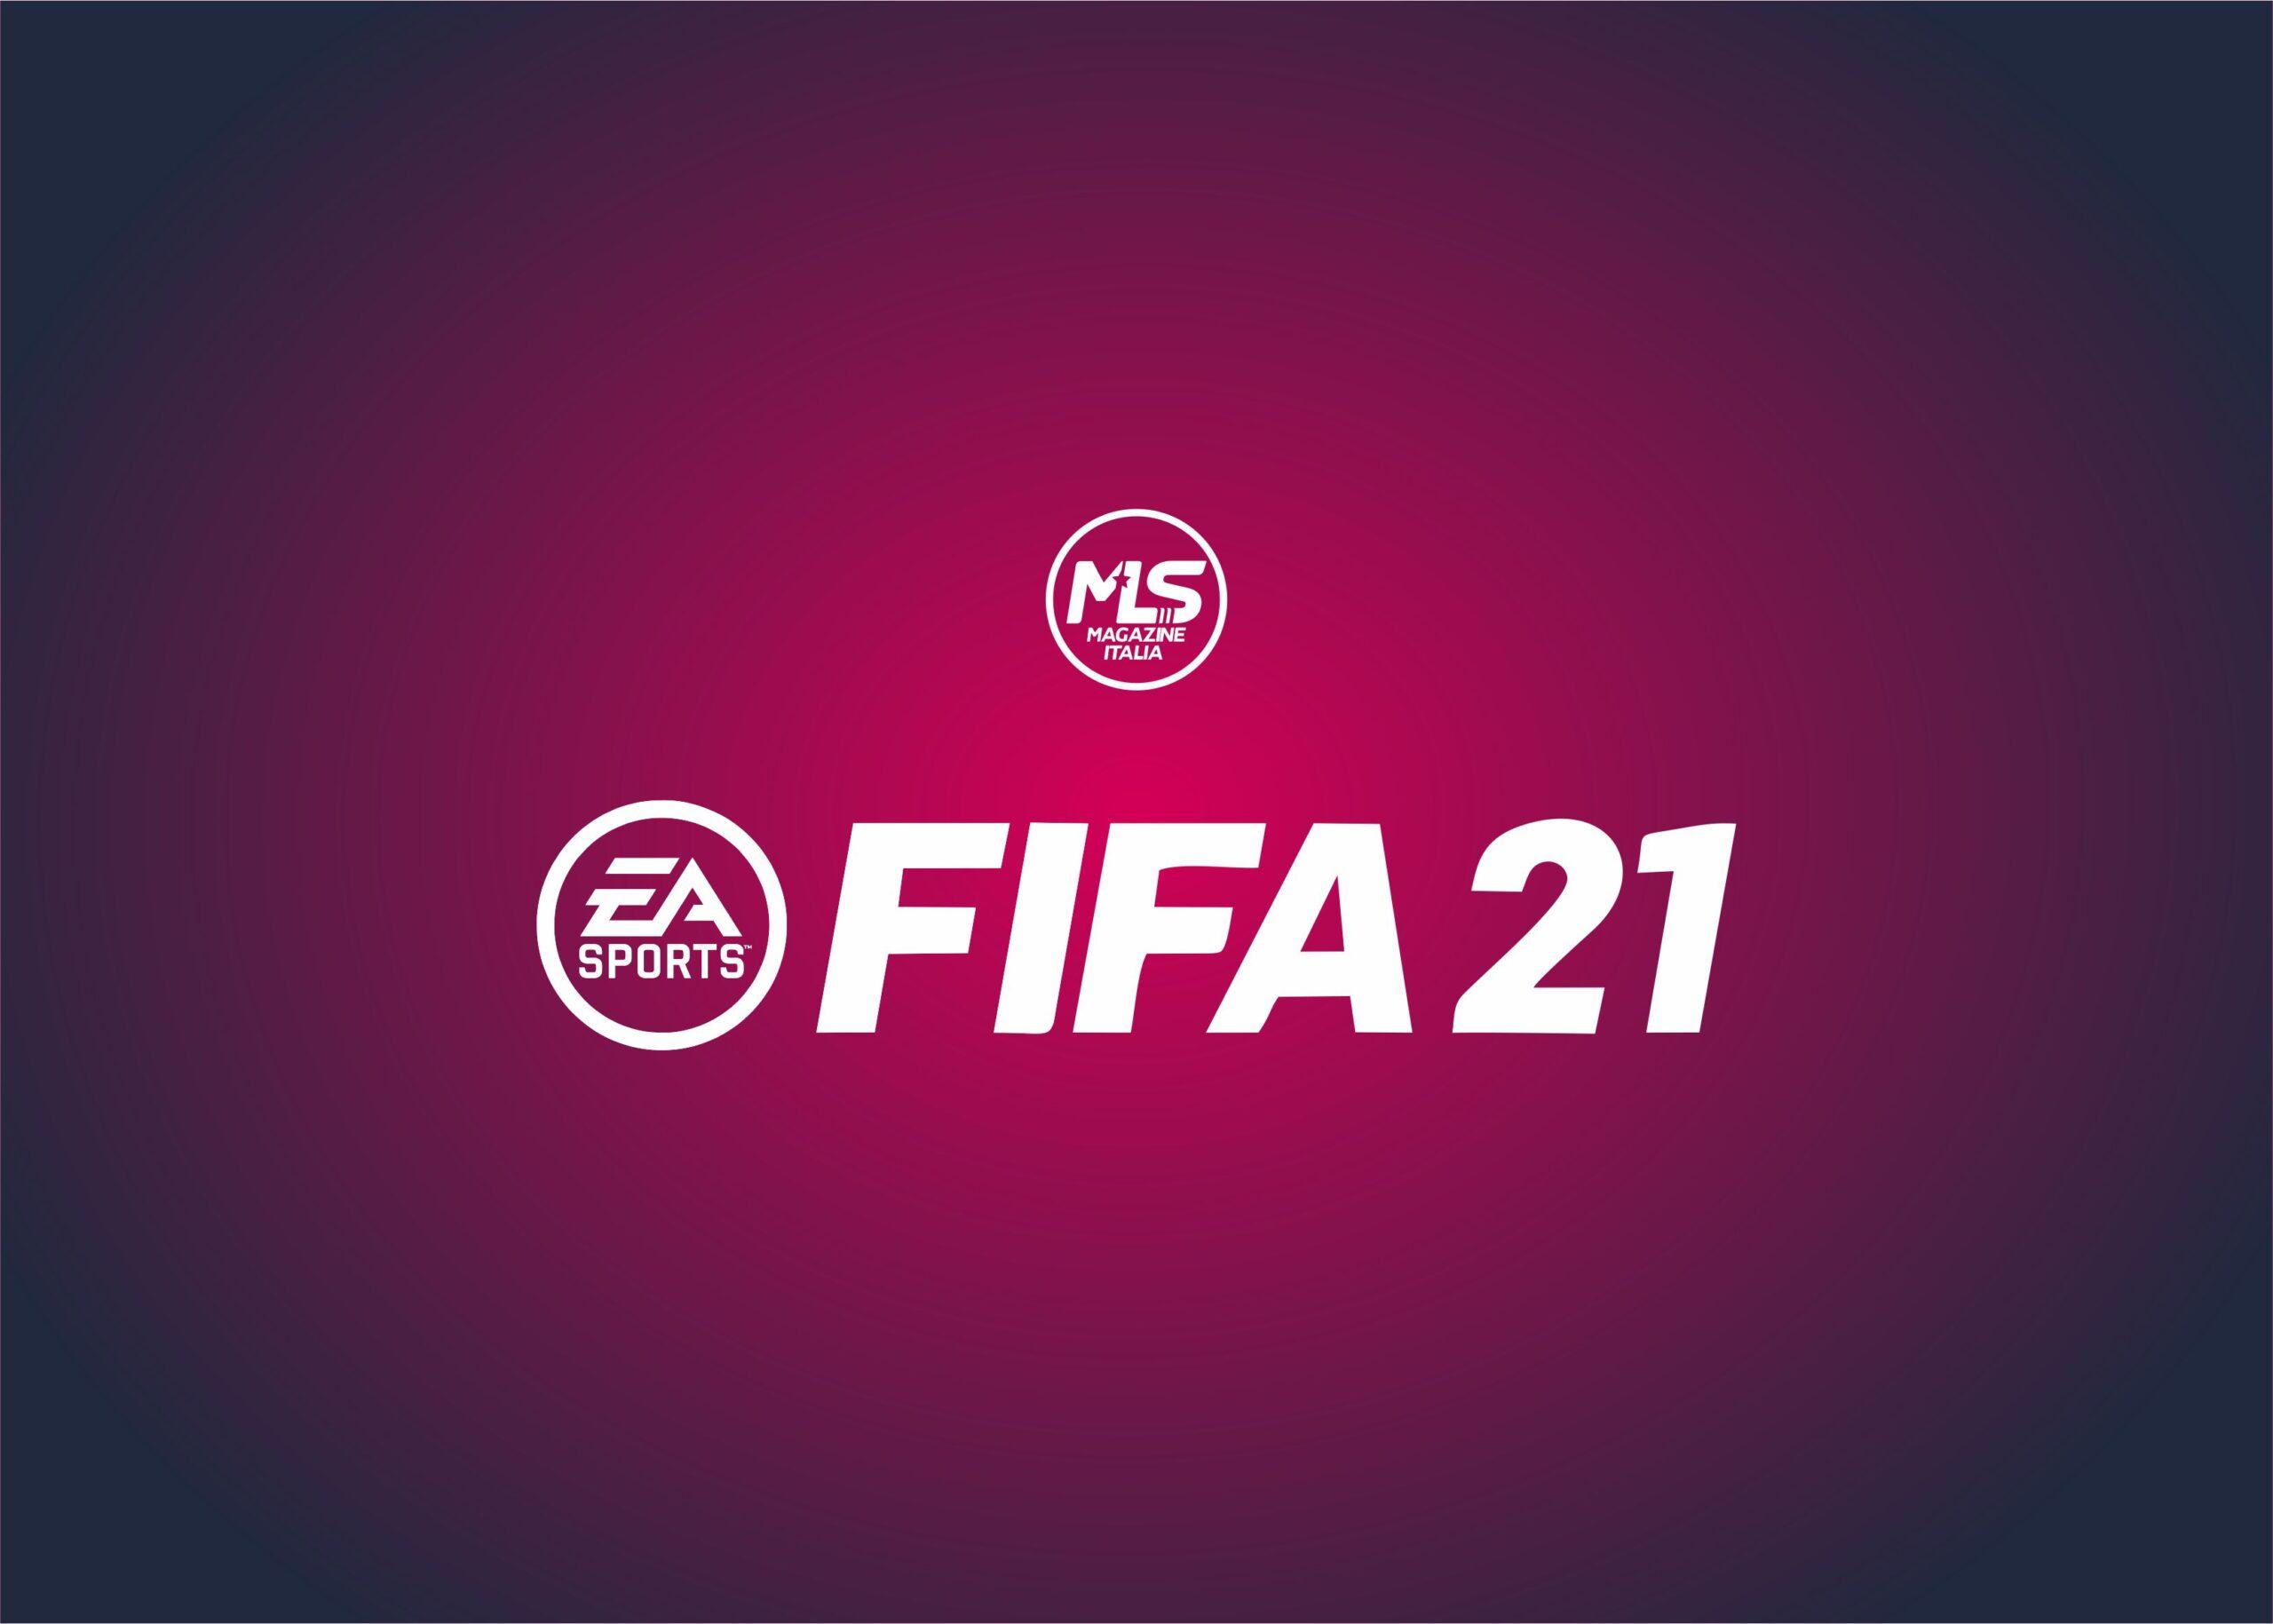 FIFA21   mls magazine italia